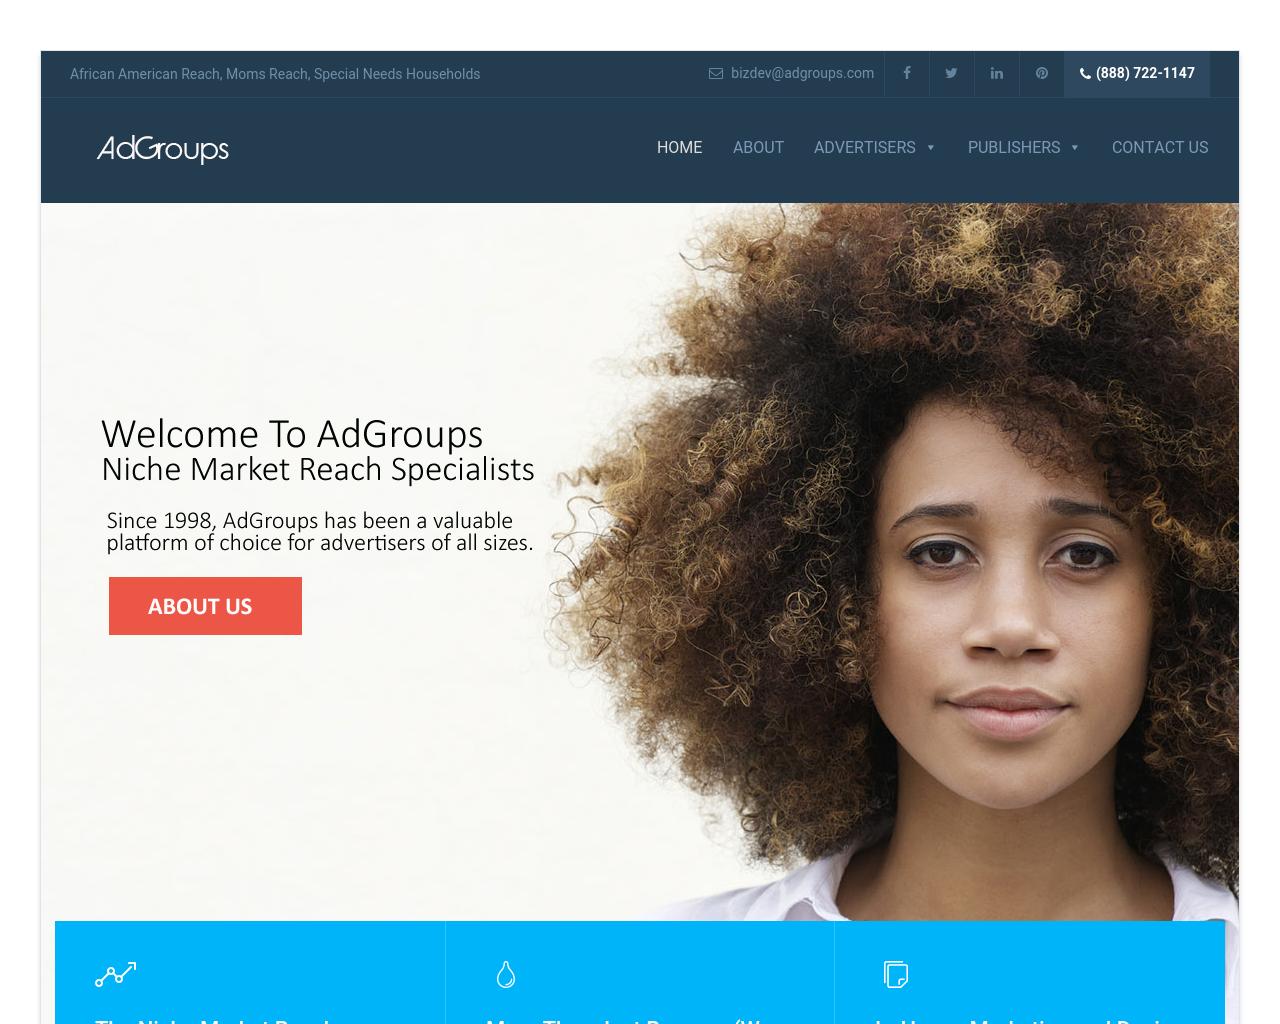 AdGroups-Advertising-Reviews-Pricing